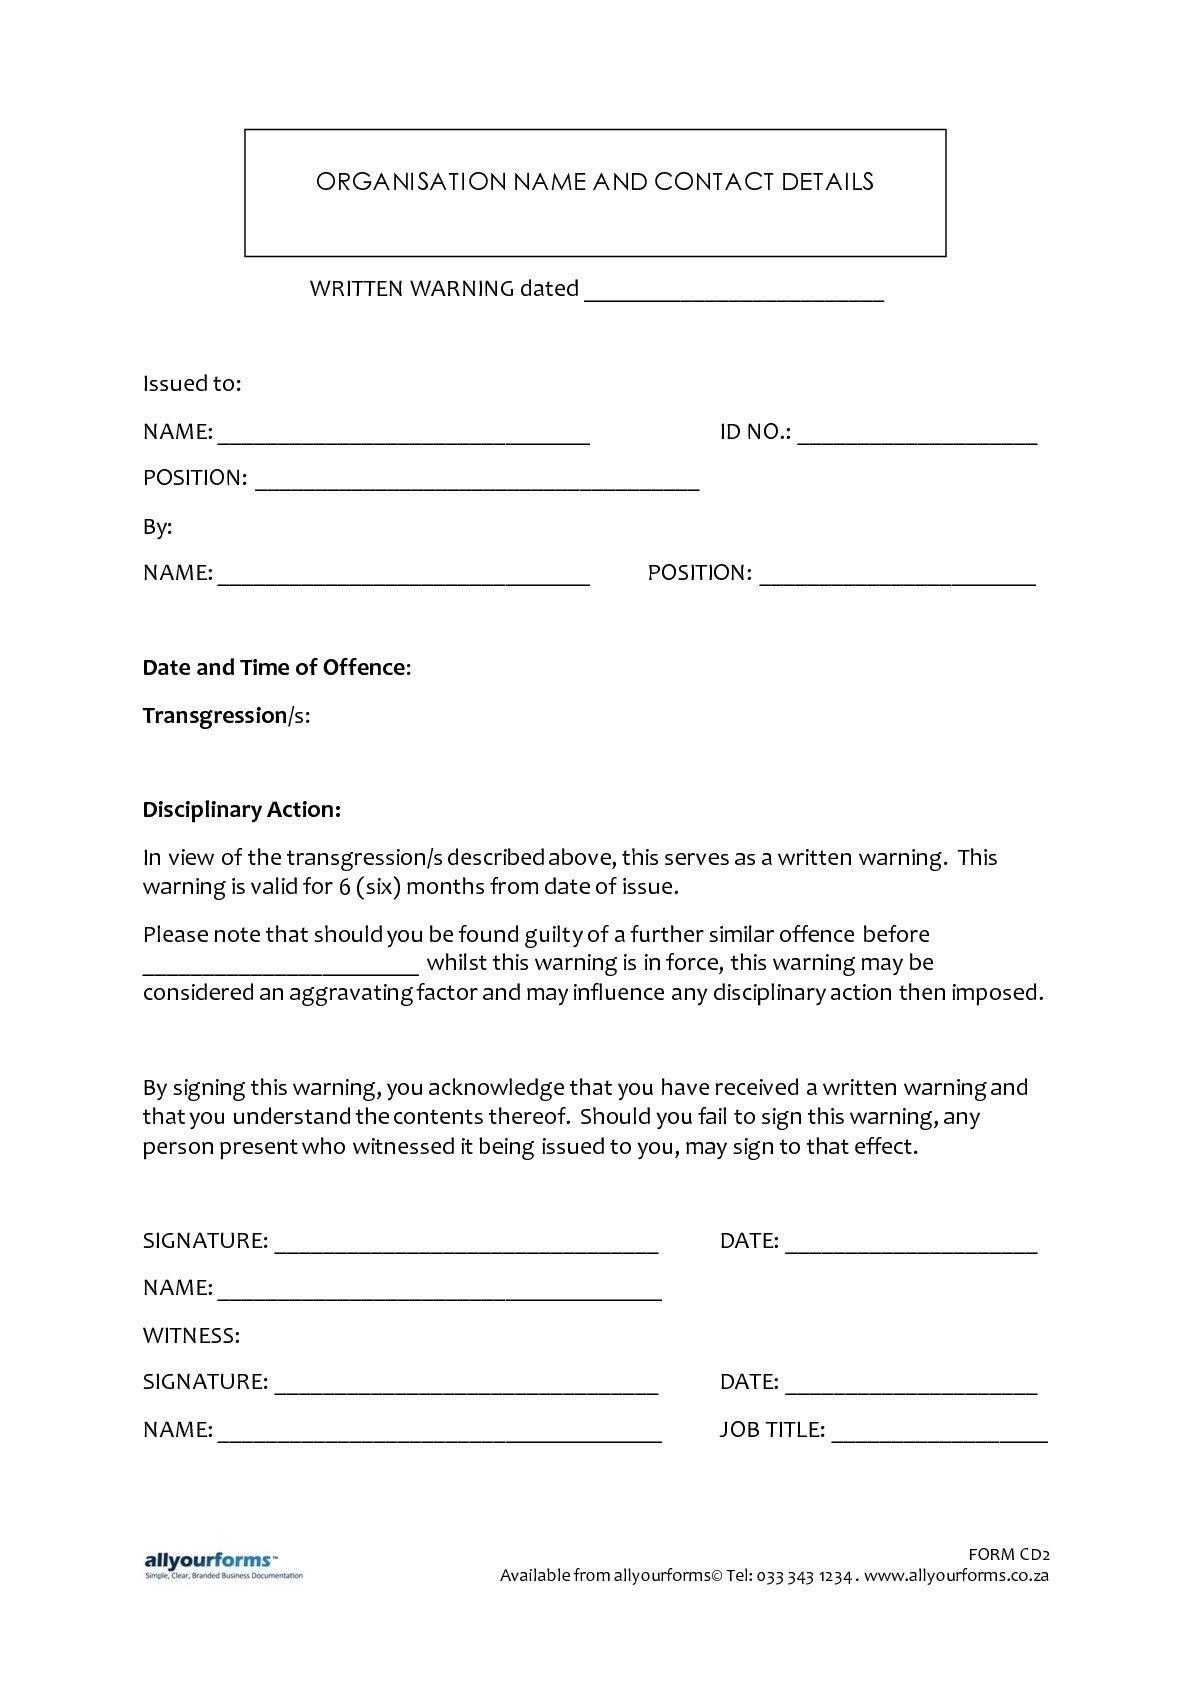 Employee Written Warning Template Written Warning Template